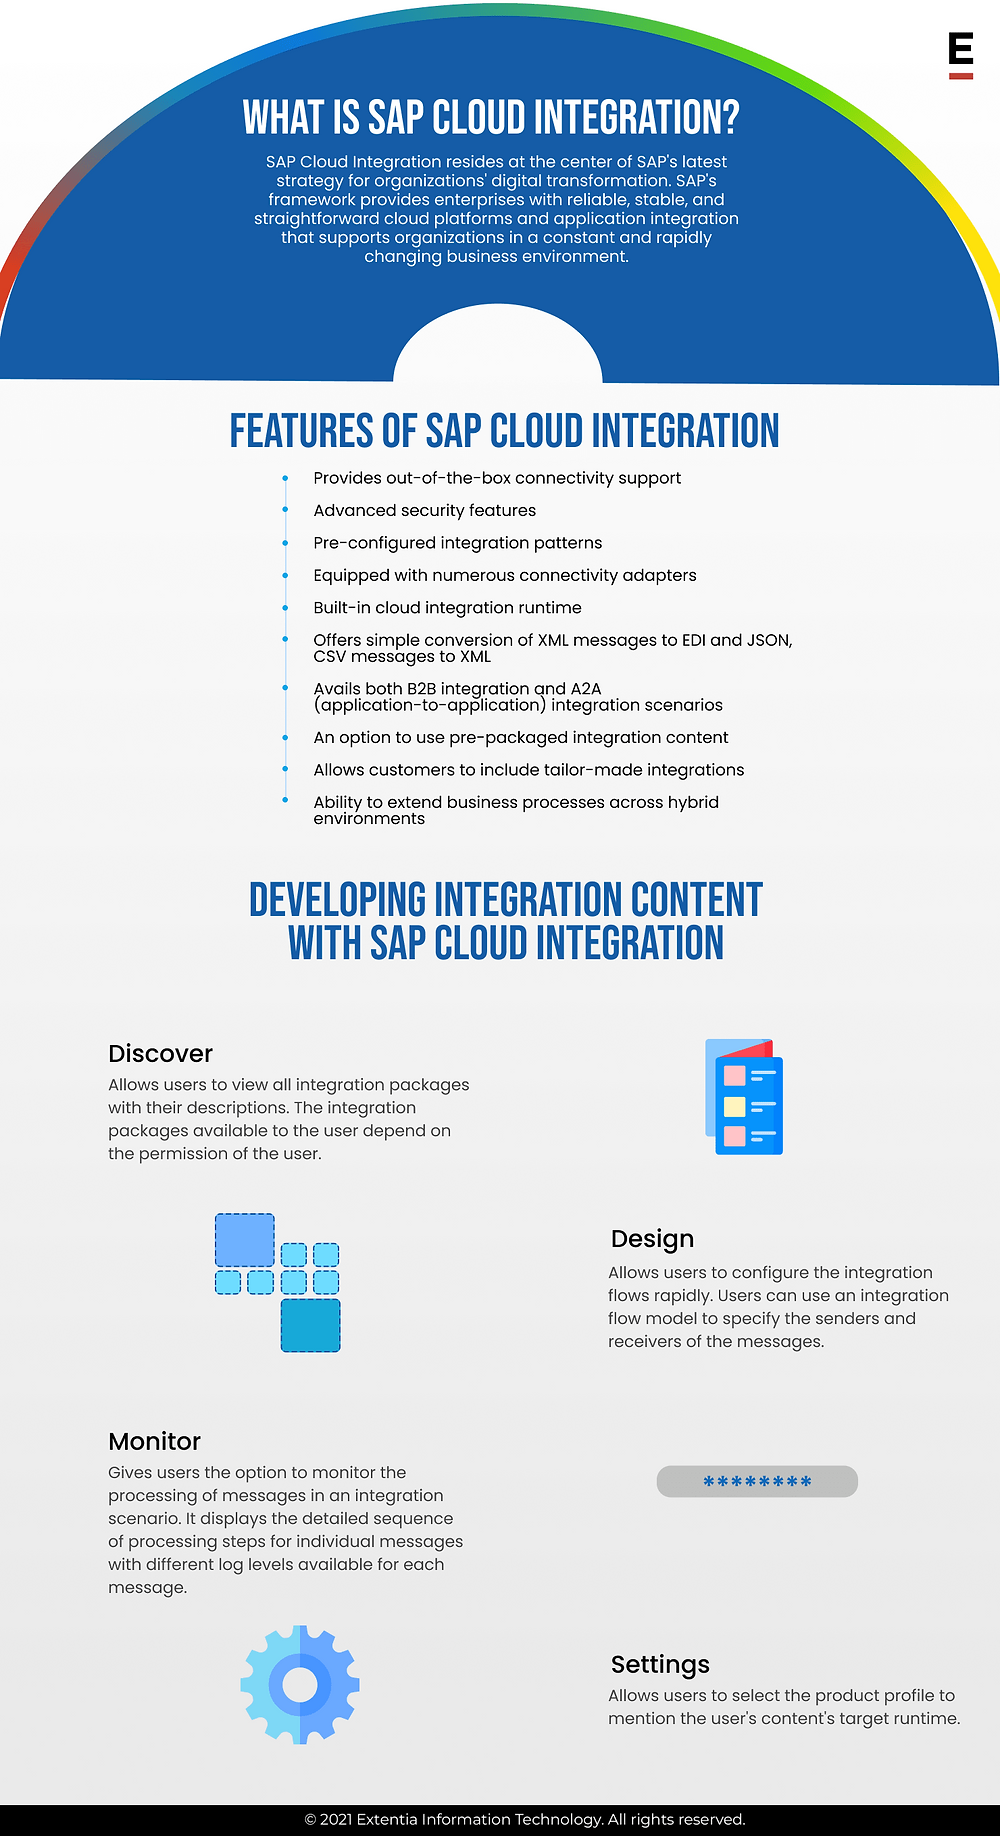 features of SAP cloud integration